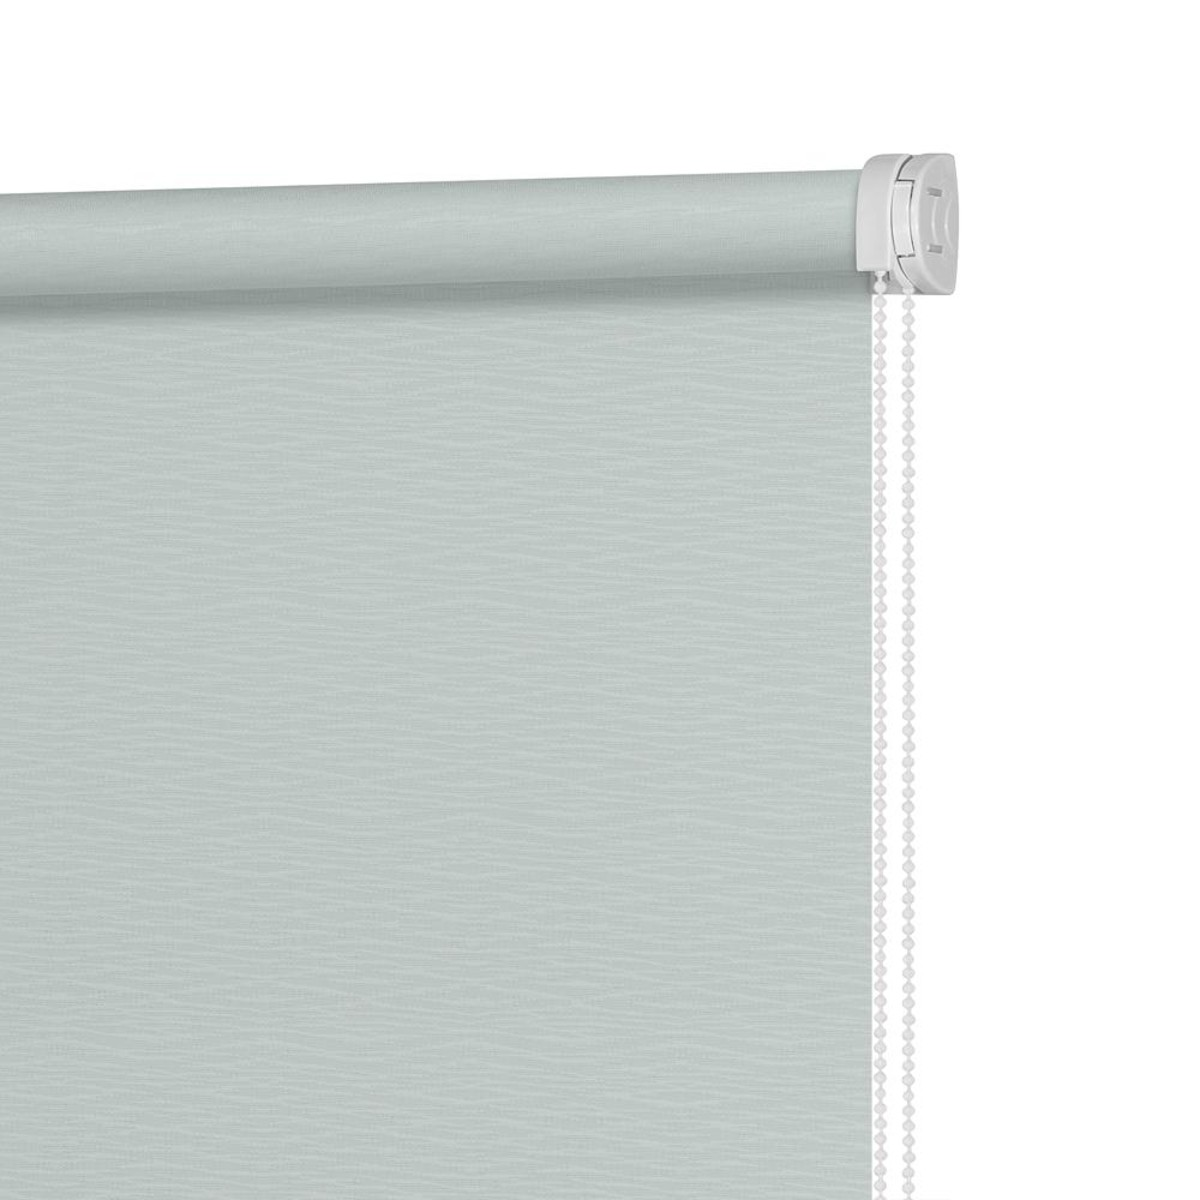 Рулонная Ора Decofest Маринела 120Х160 Цвет Голубой